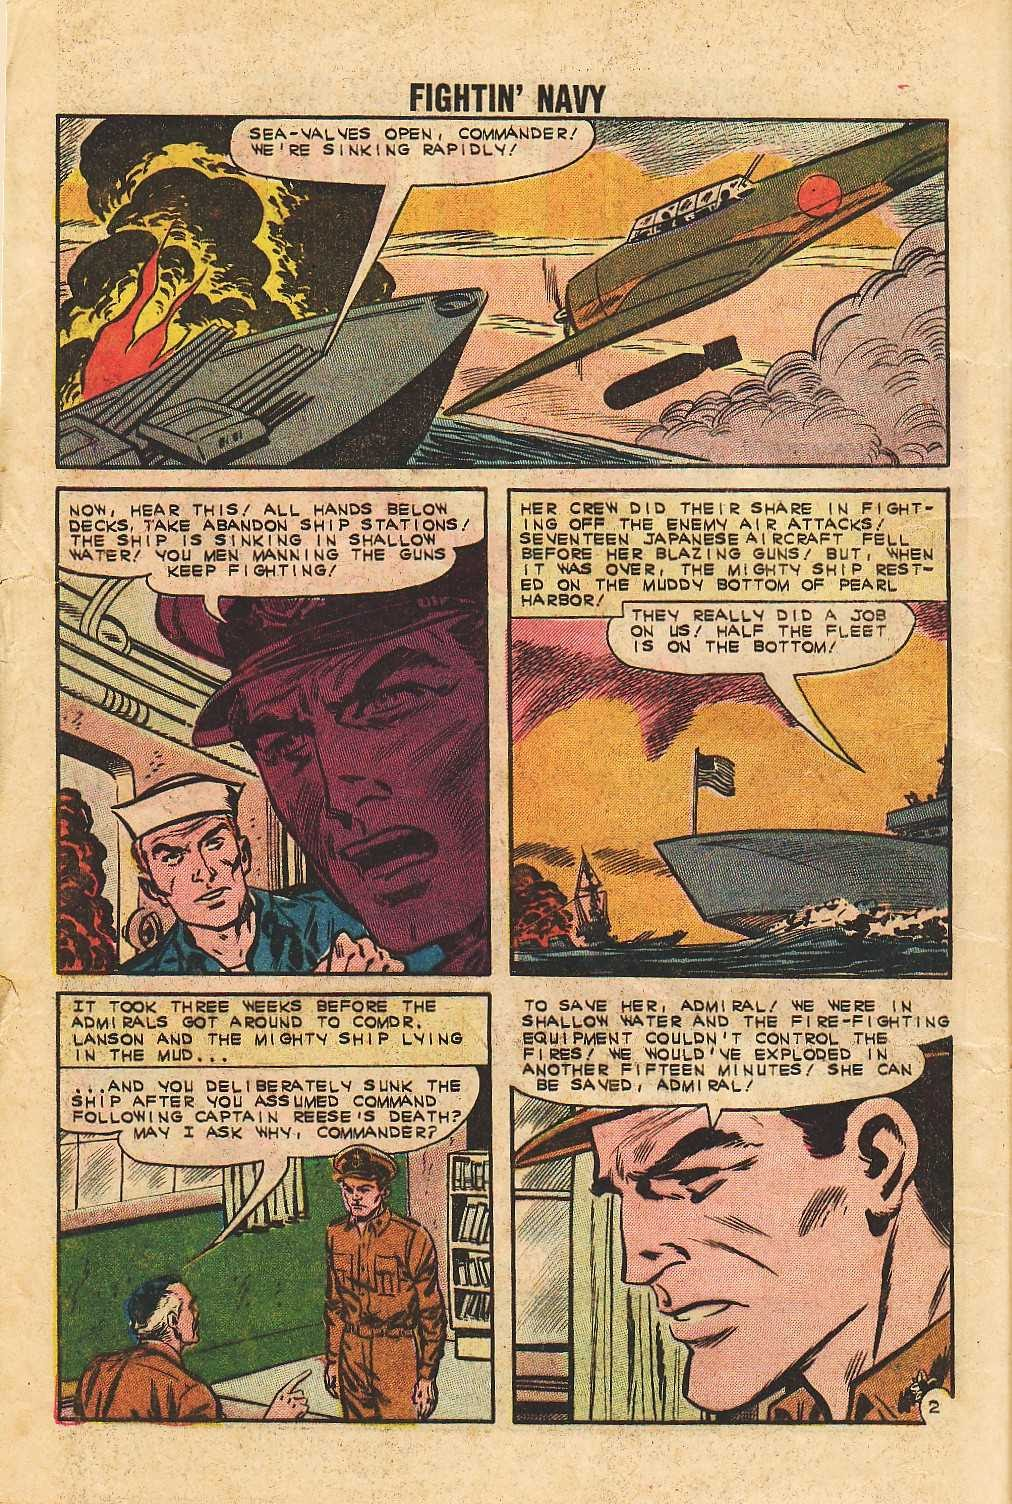 Read online Fightin' Navy comic -  Issue #105 - 4